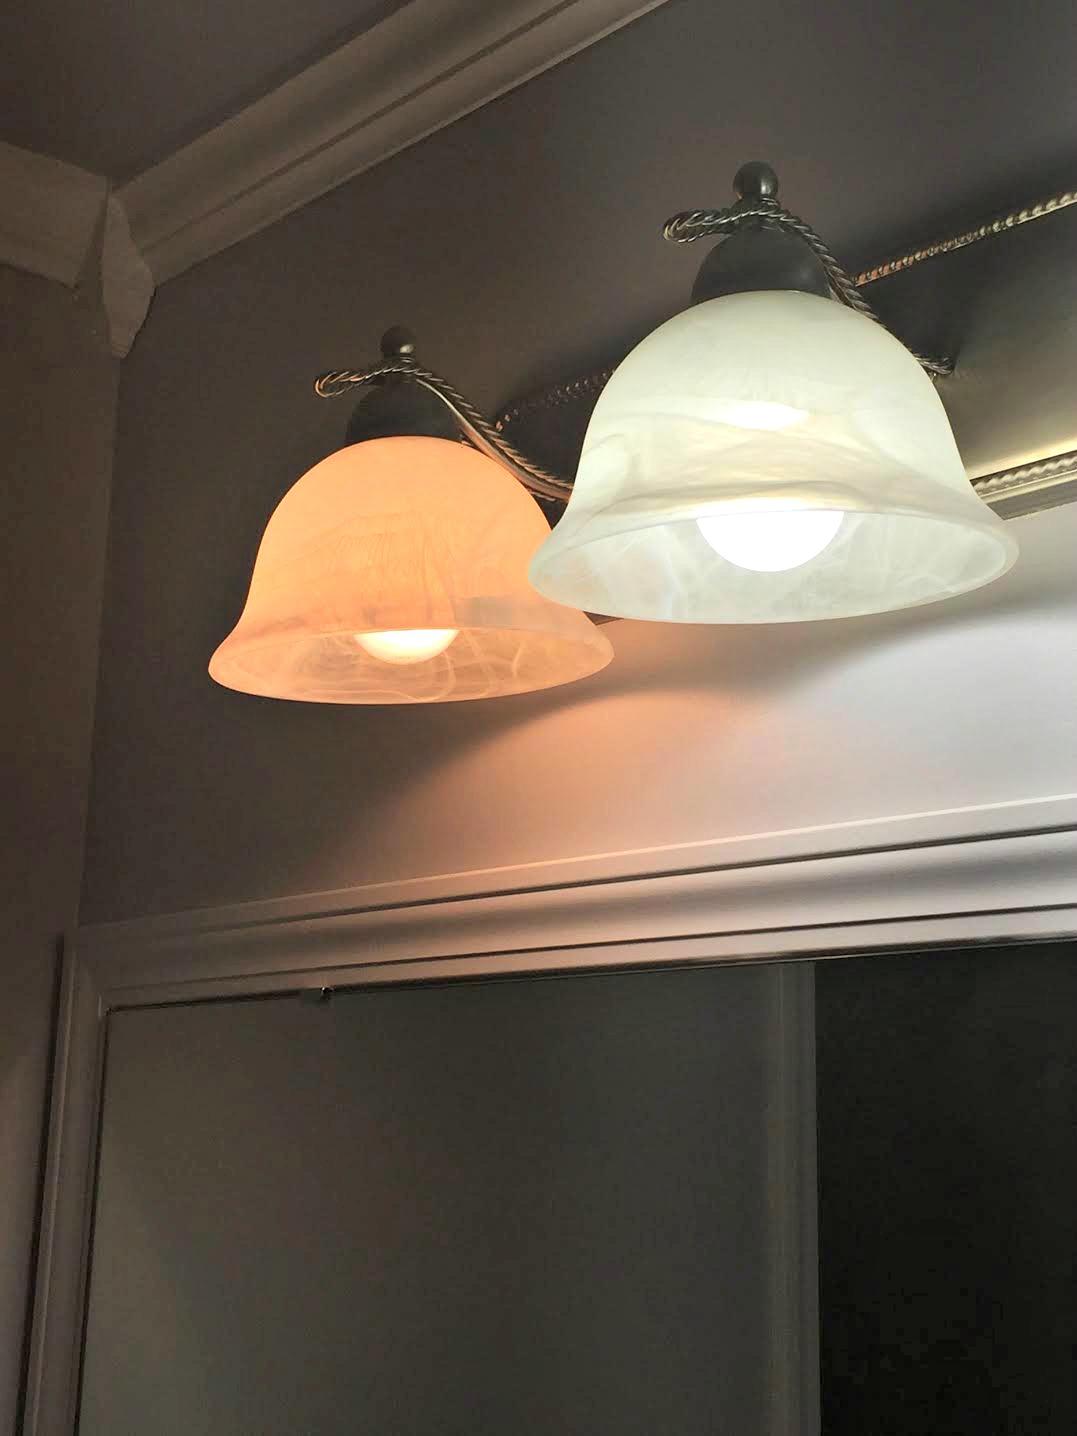 Day Time Light Bulbs: The Daylight Bulb (Amazing!)